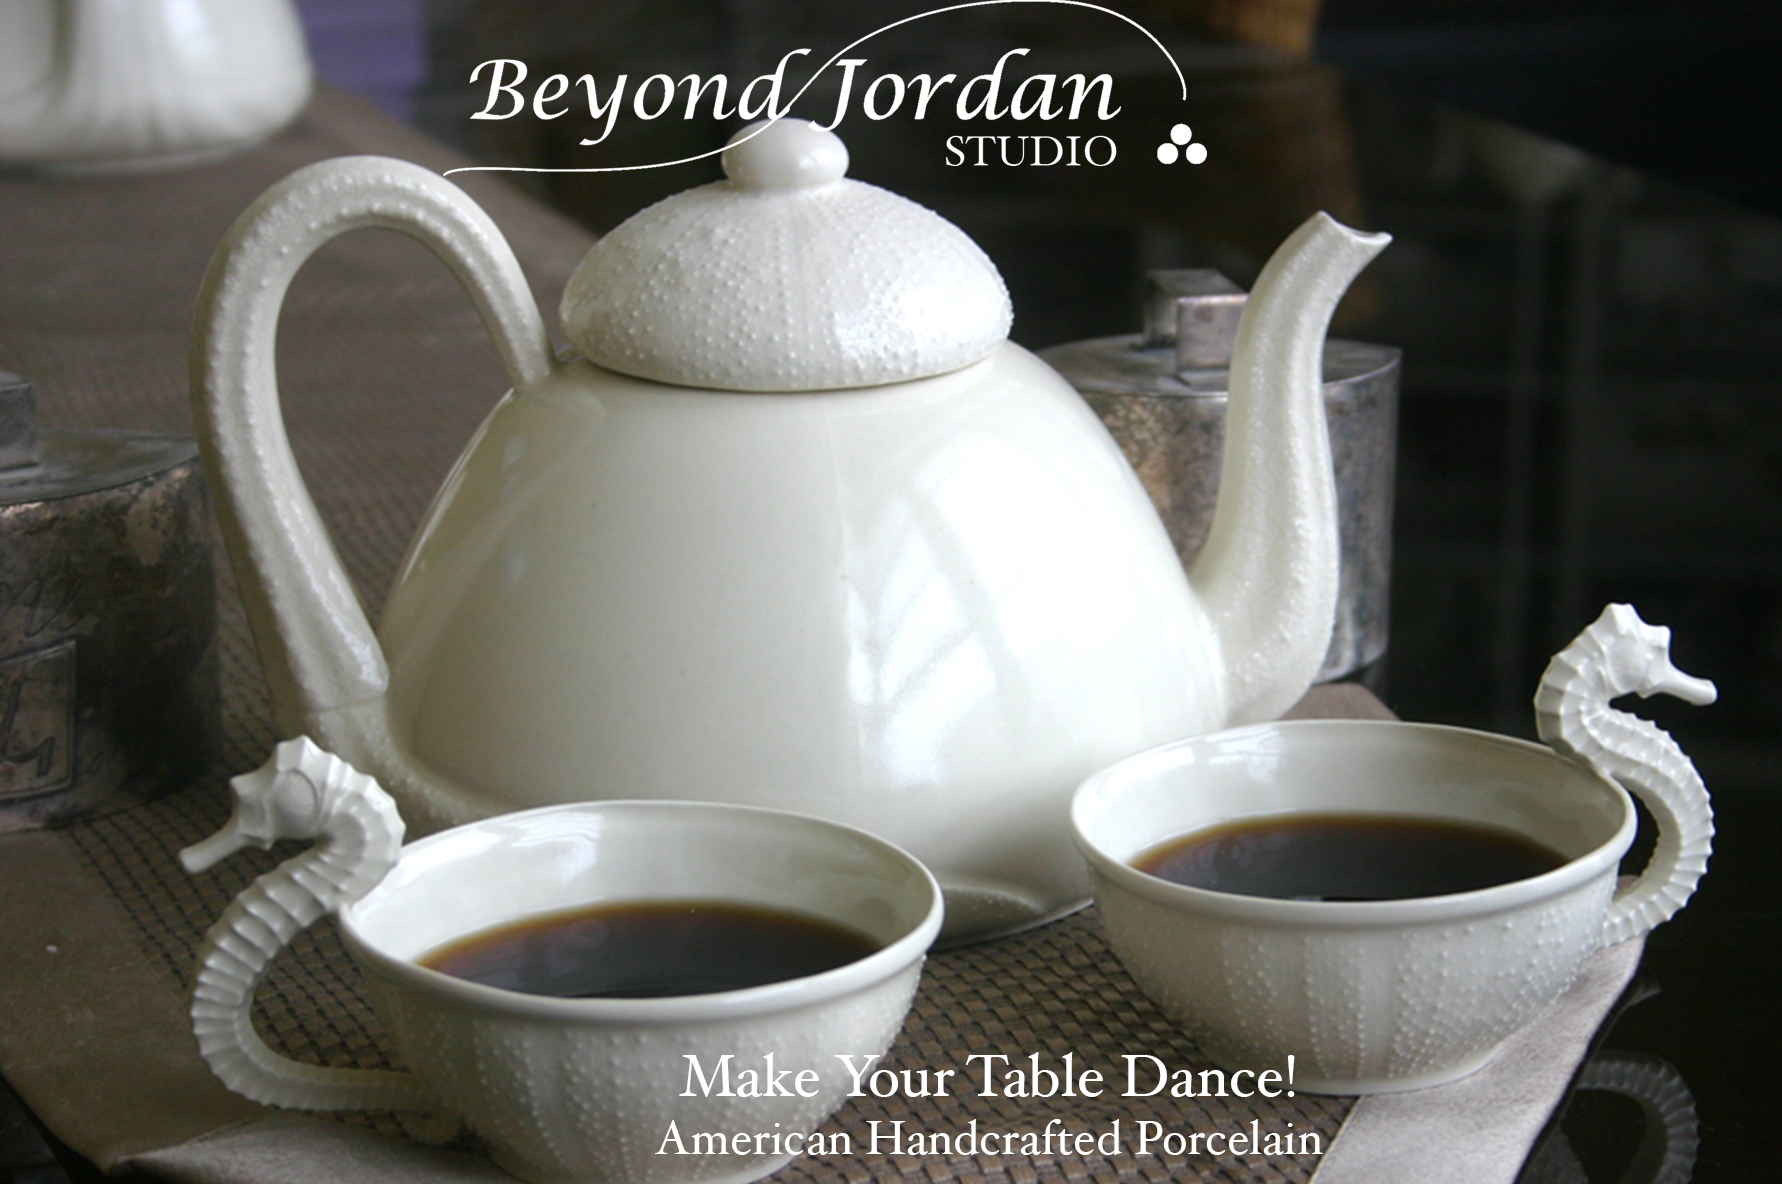 Seahorse and Sea Urchin Porcelain Teacups